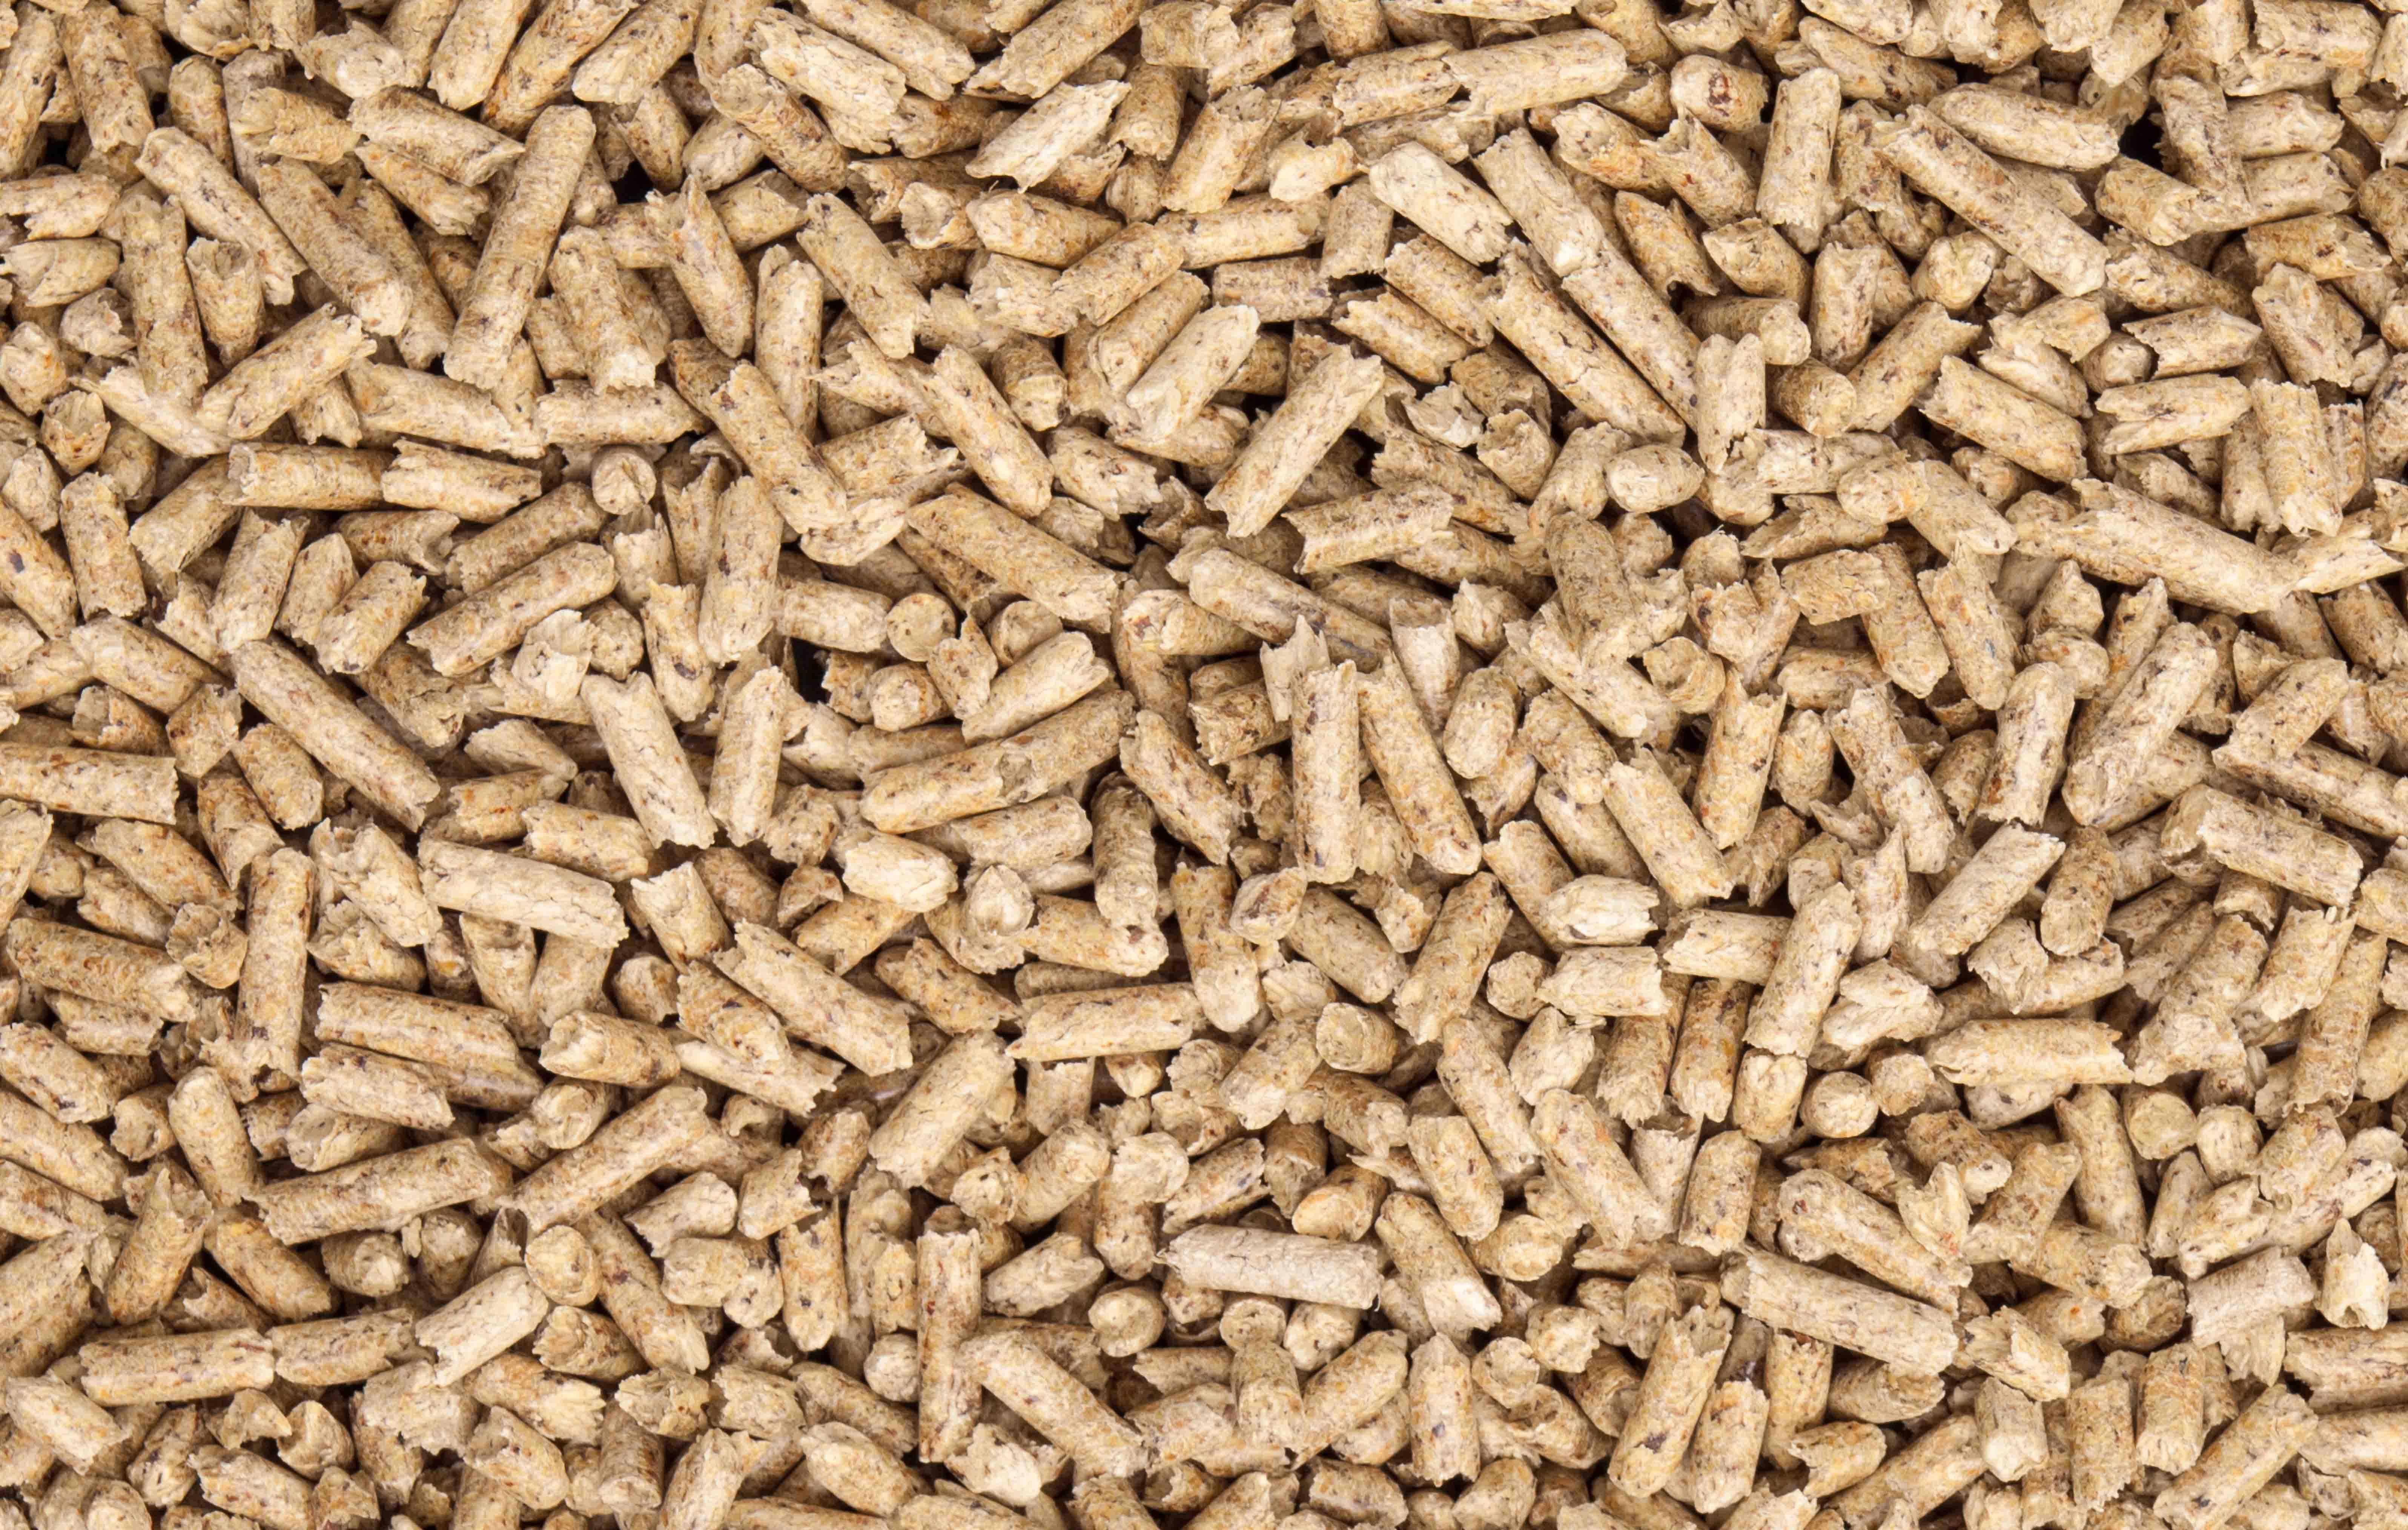 a bunch of wood pellets